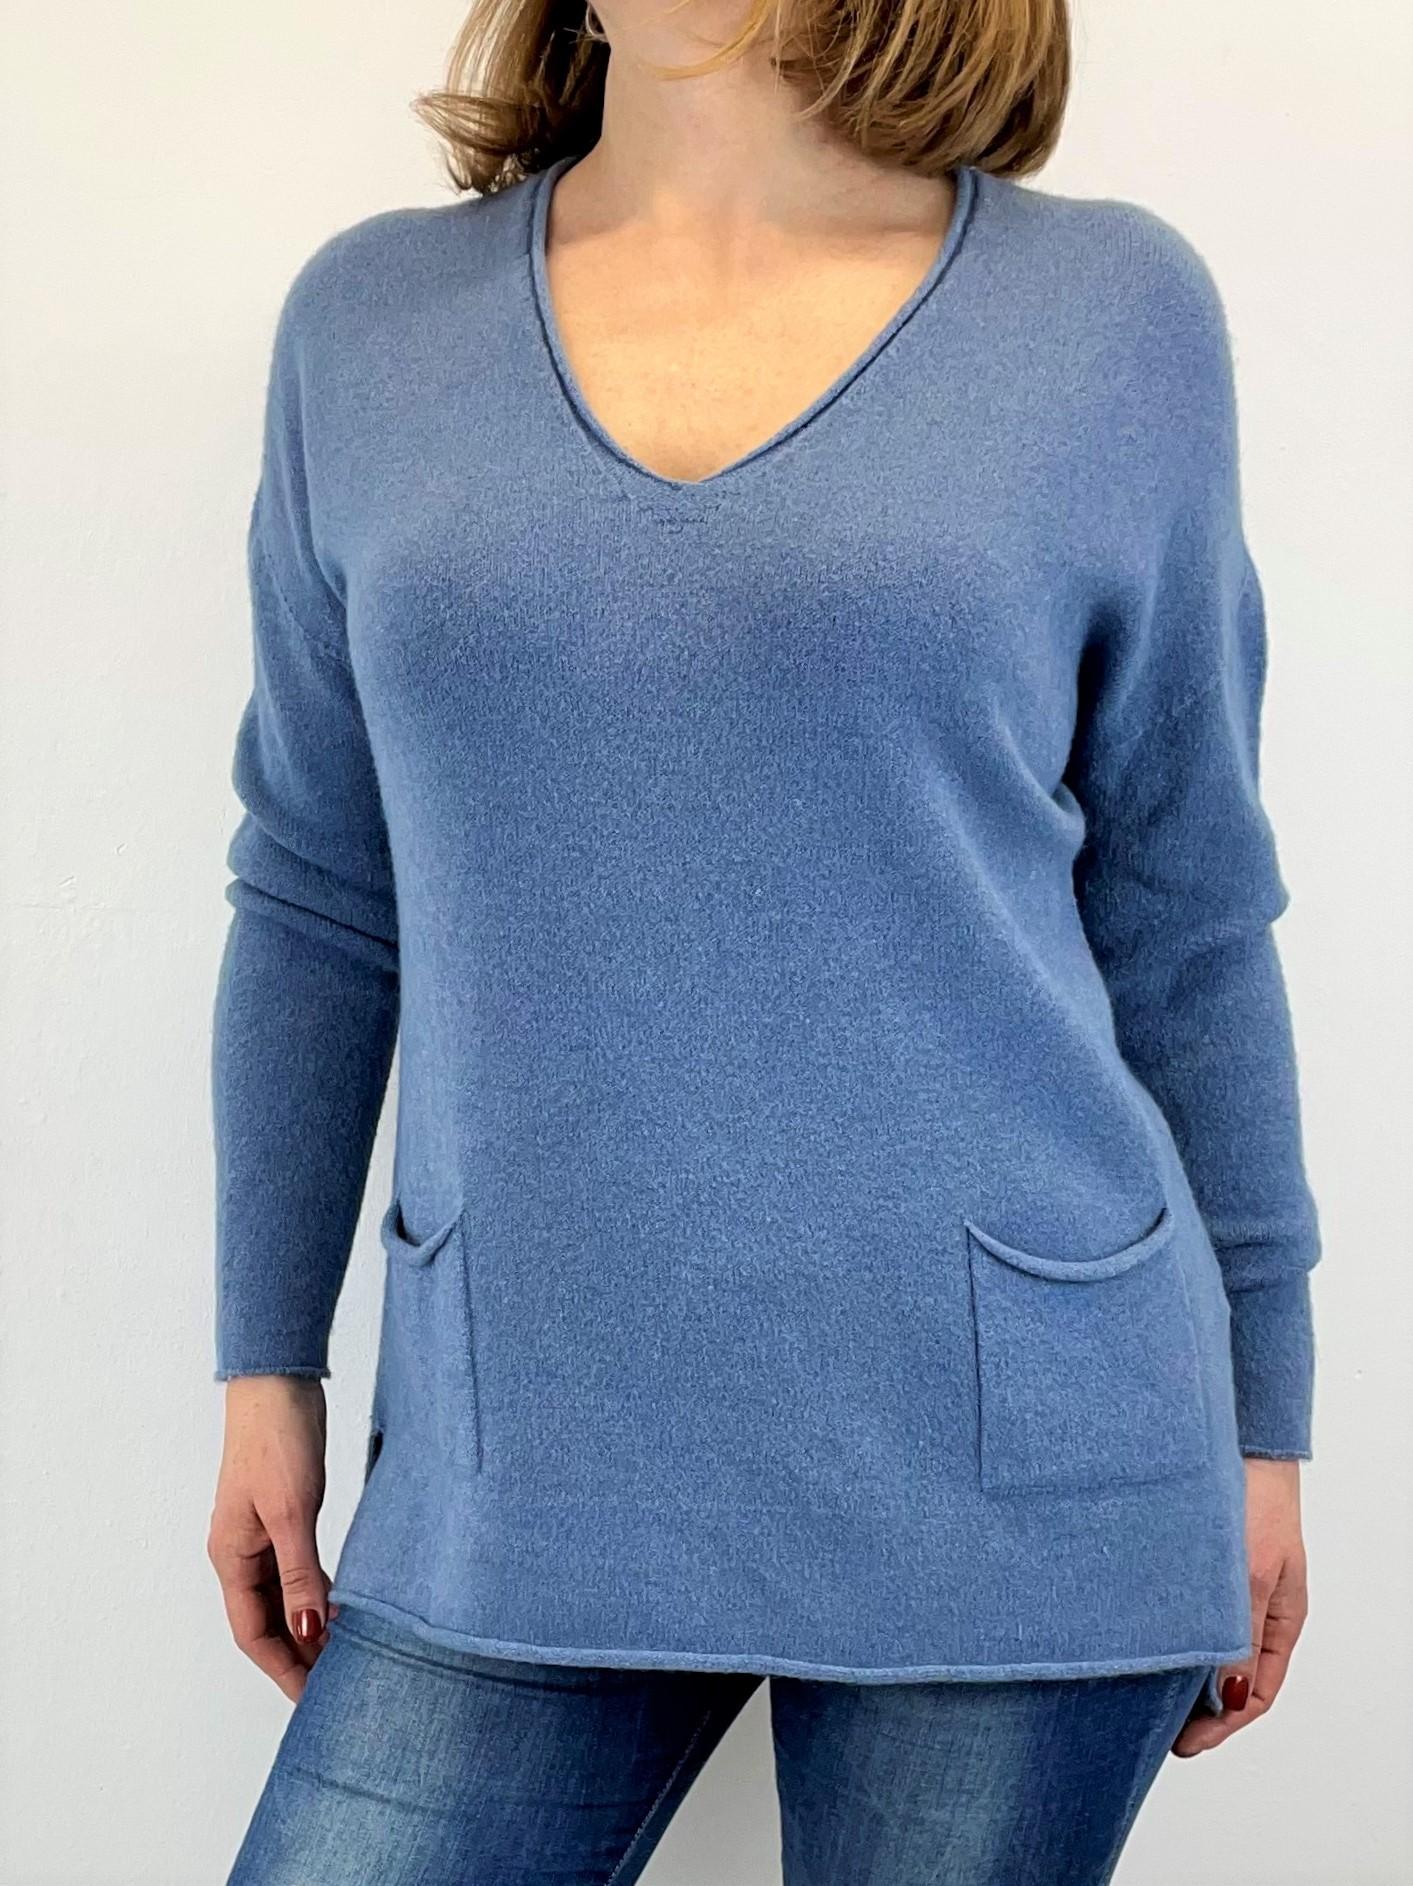 Feinstrick Pullover in Blau